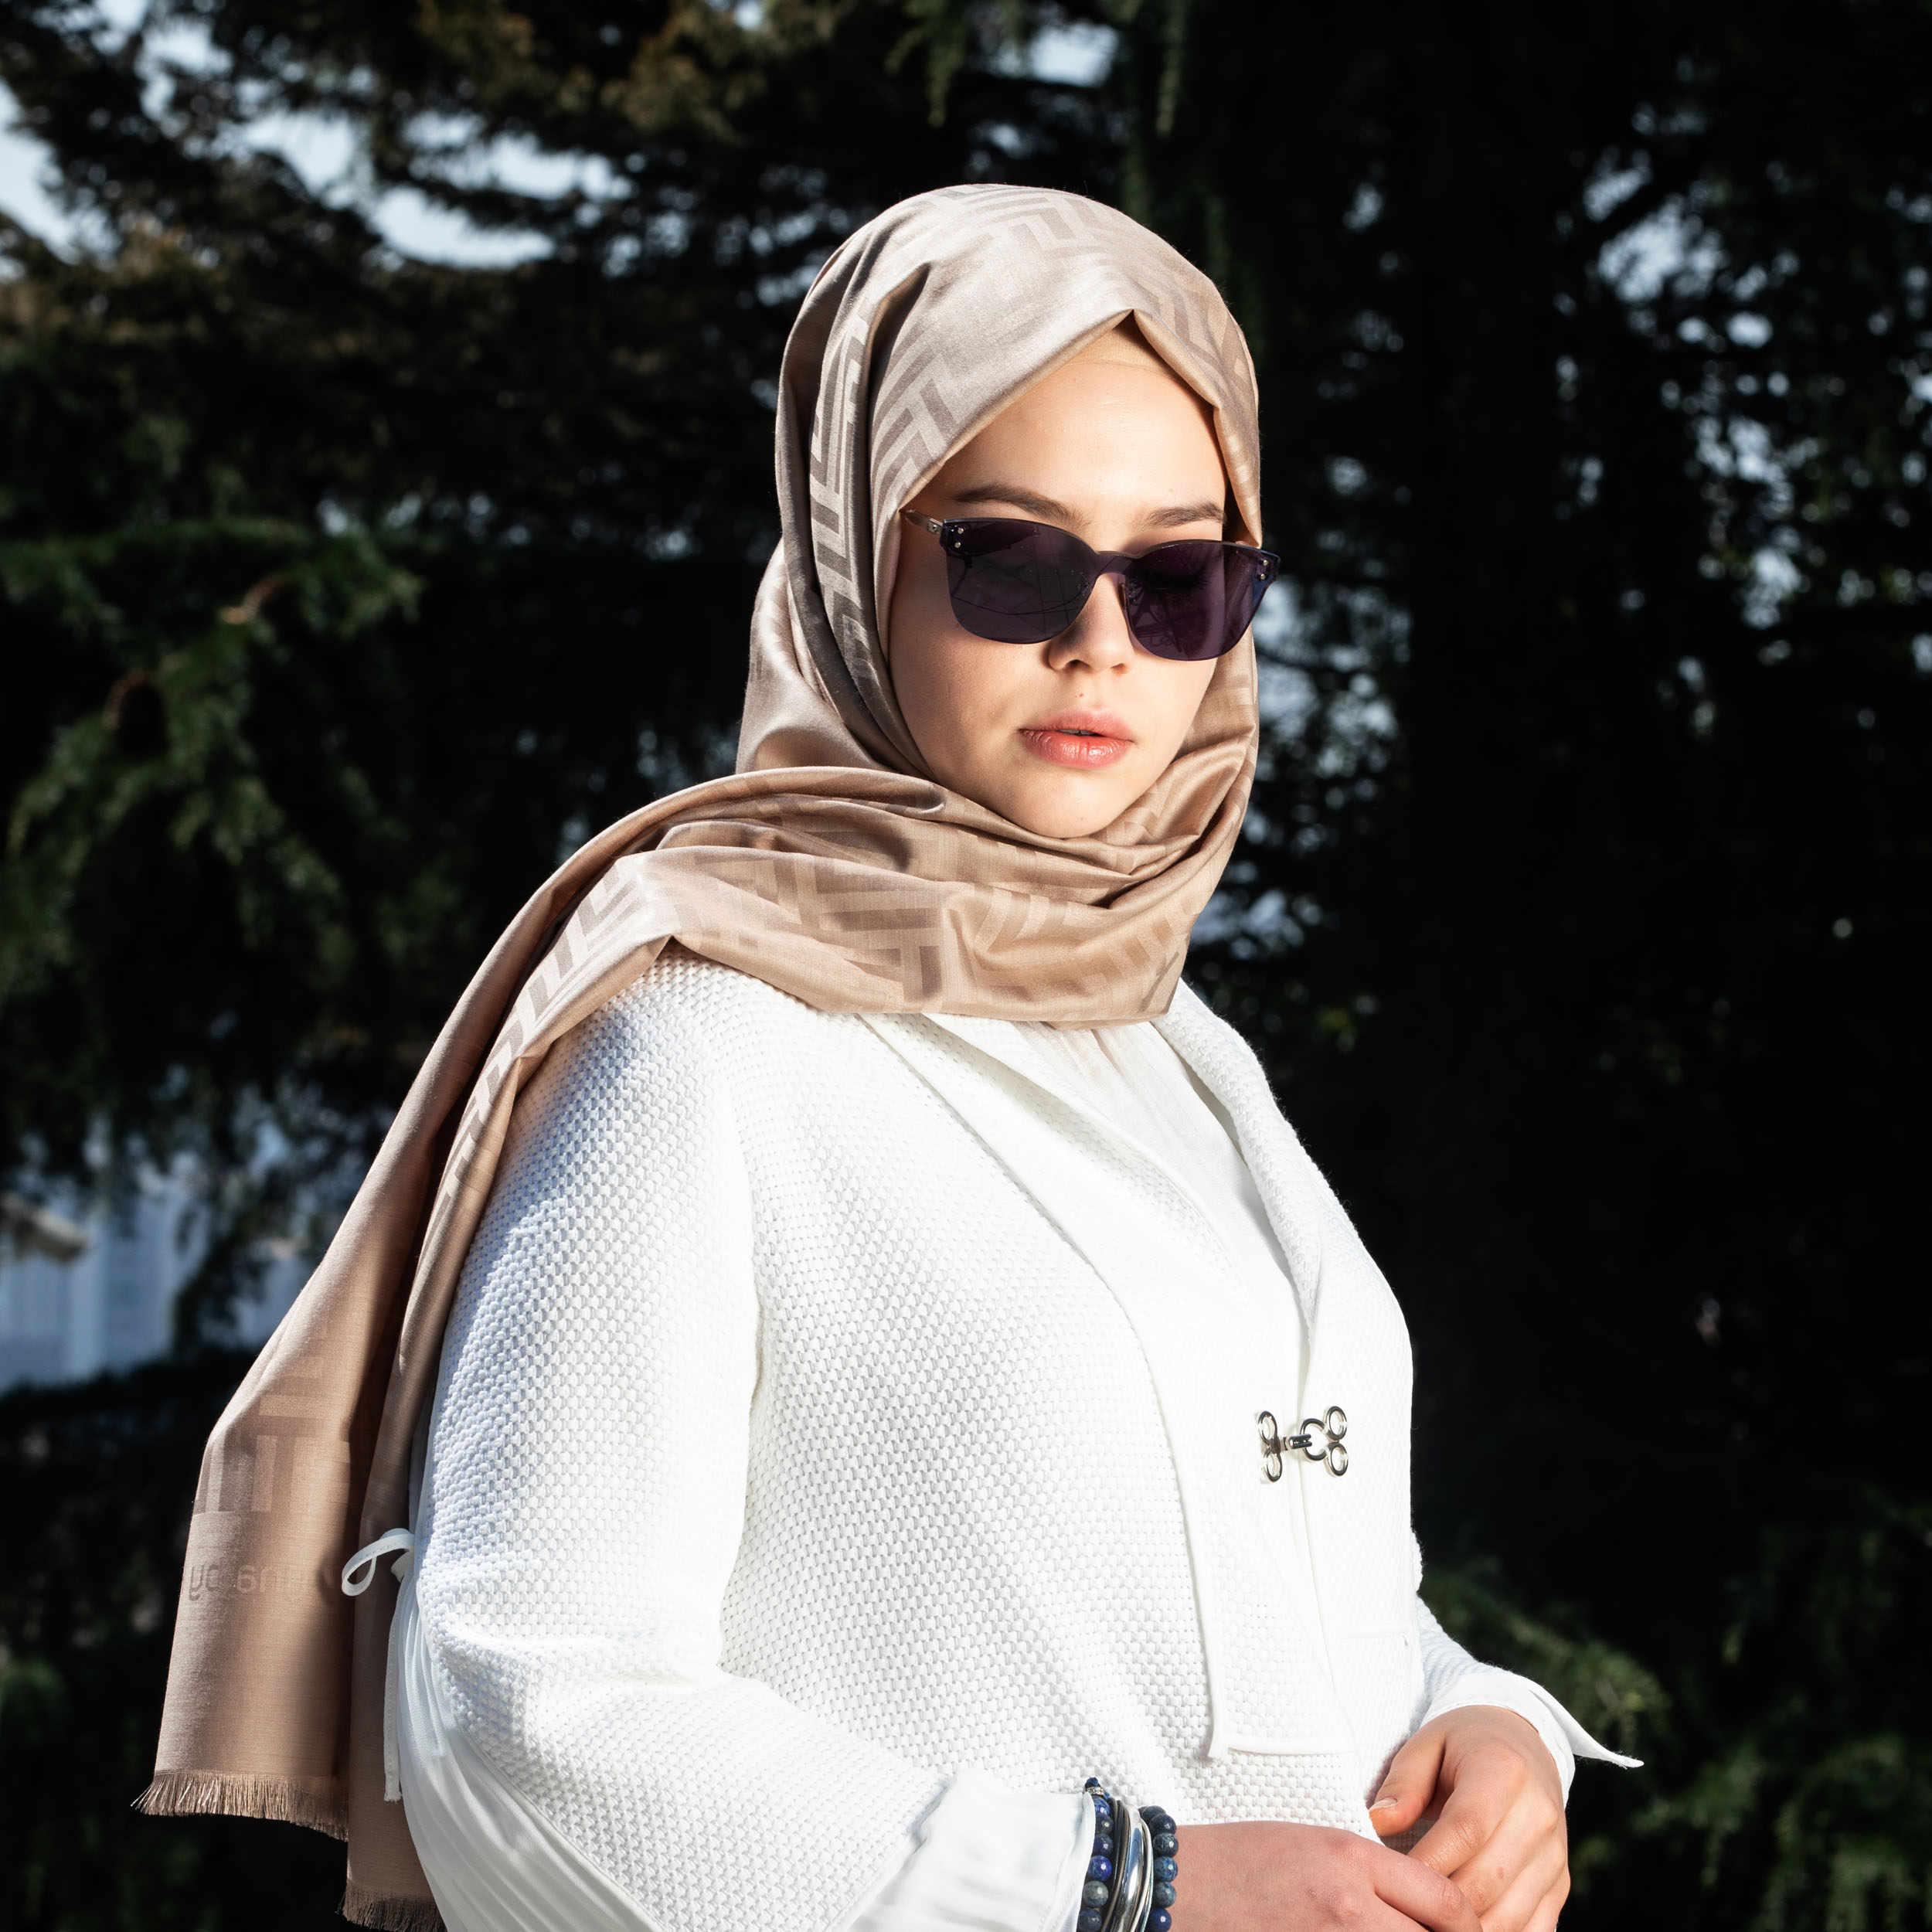 LeynabyHF bufanda de Muscat Beige/chal 190cm * 70cm seda y lana ...